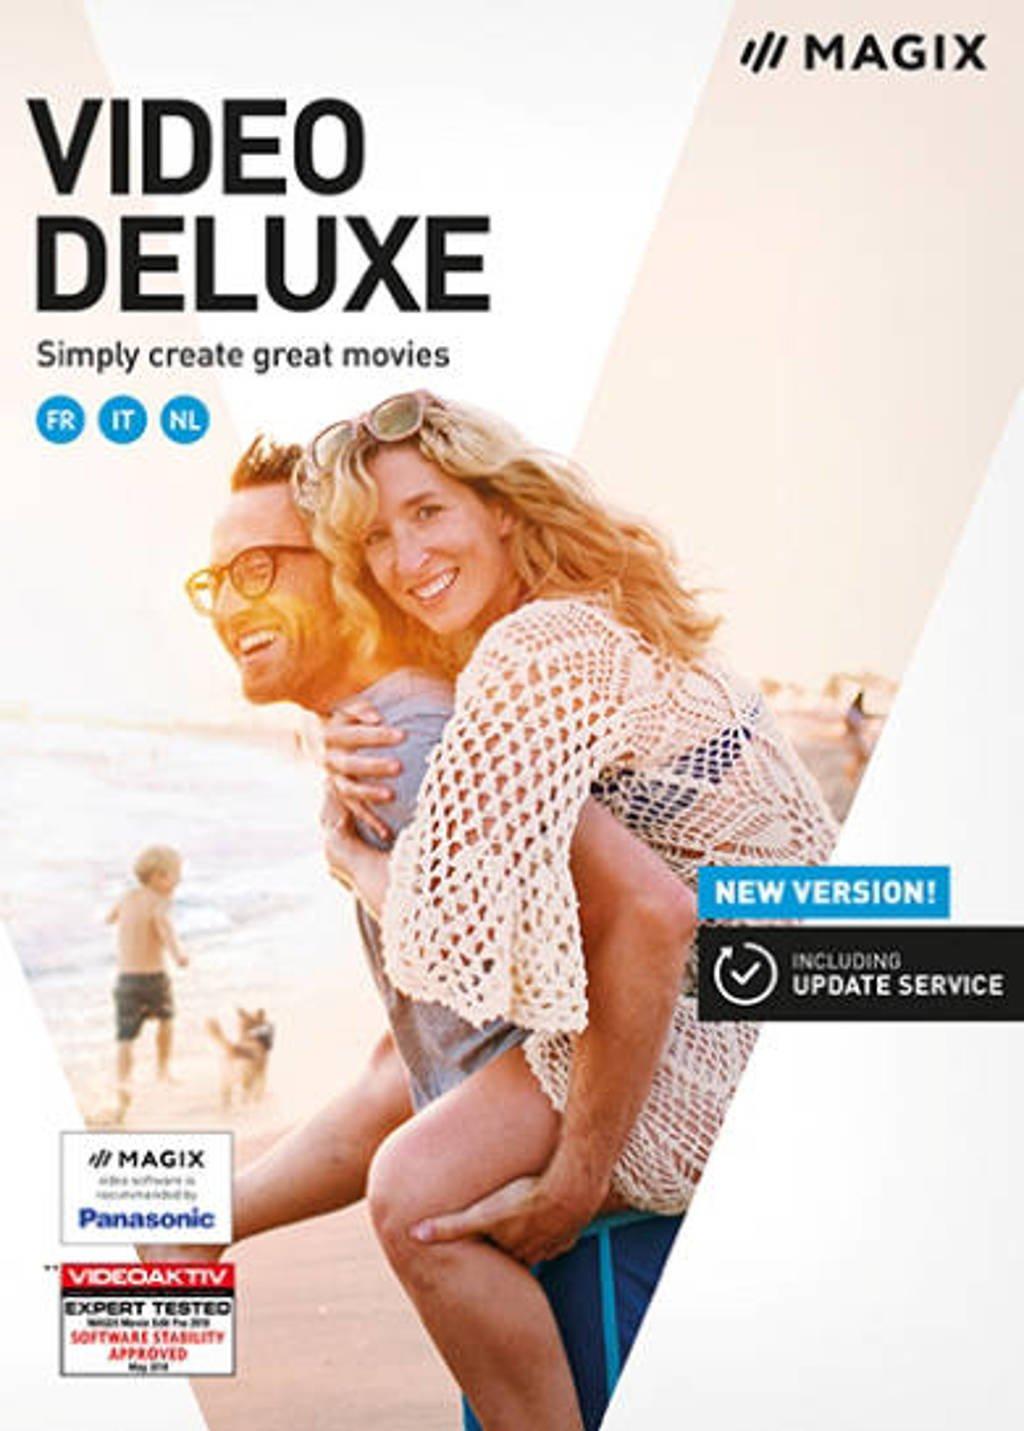 Magix video deluxe (PC)